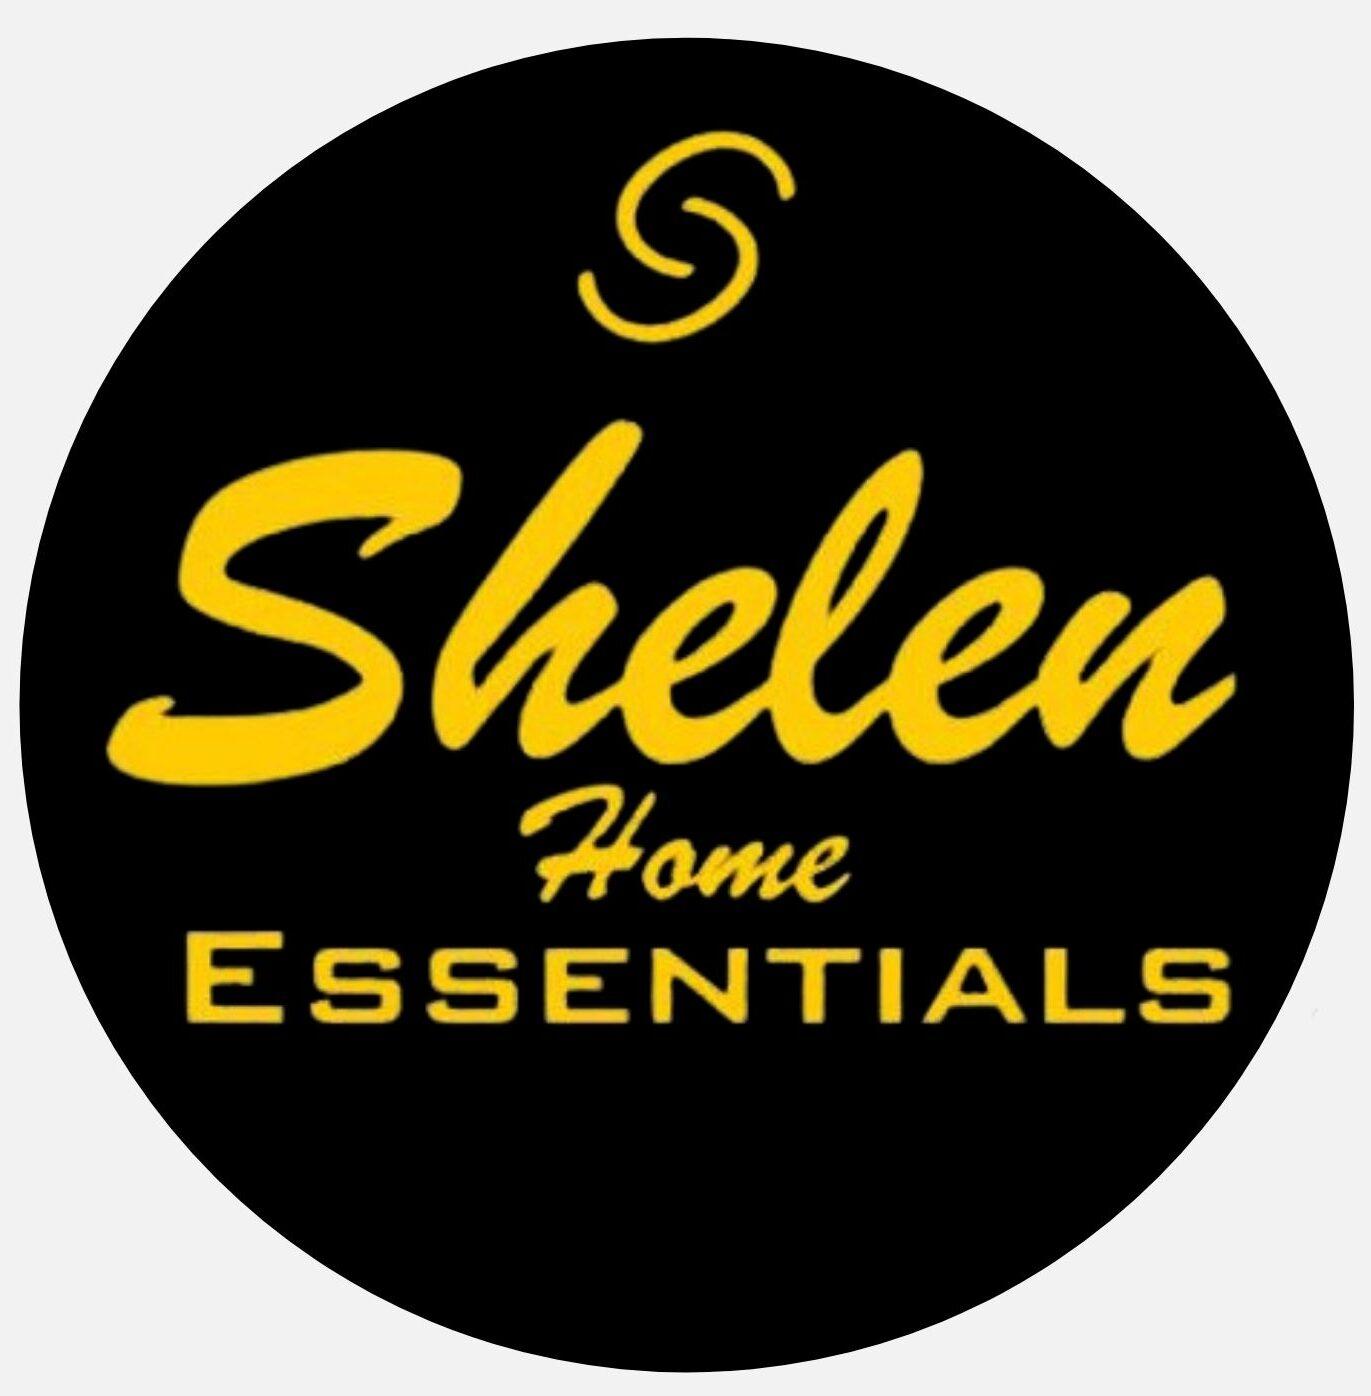 Shelen Home Essentials